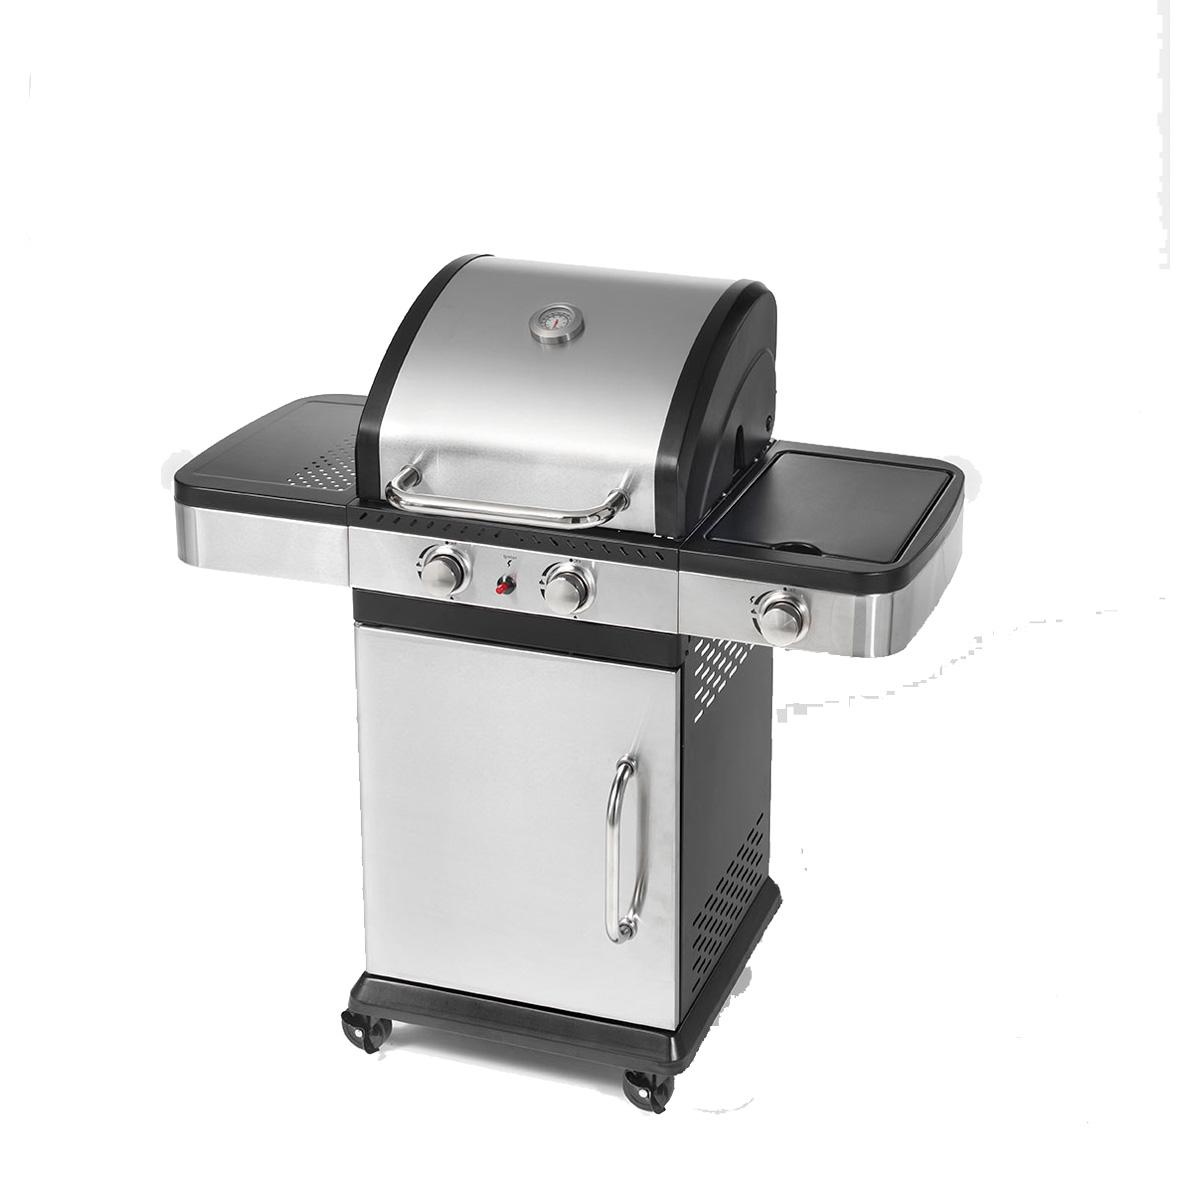 Ompagrill Indianapolis 3 Titanium gas barbecue